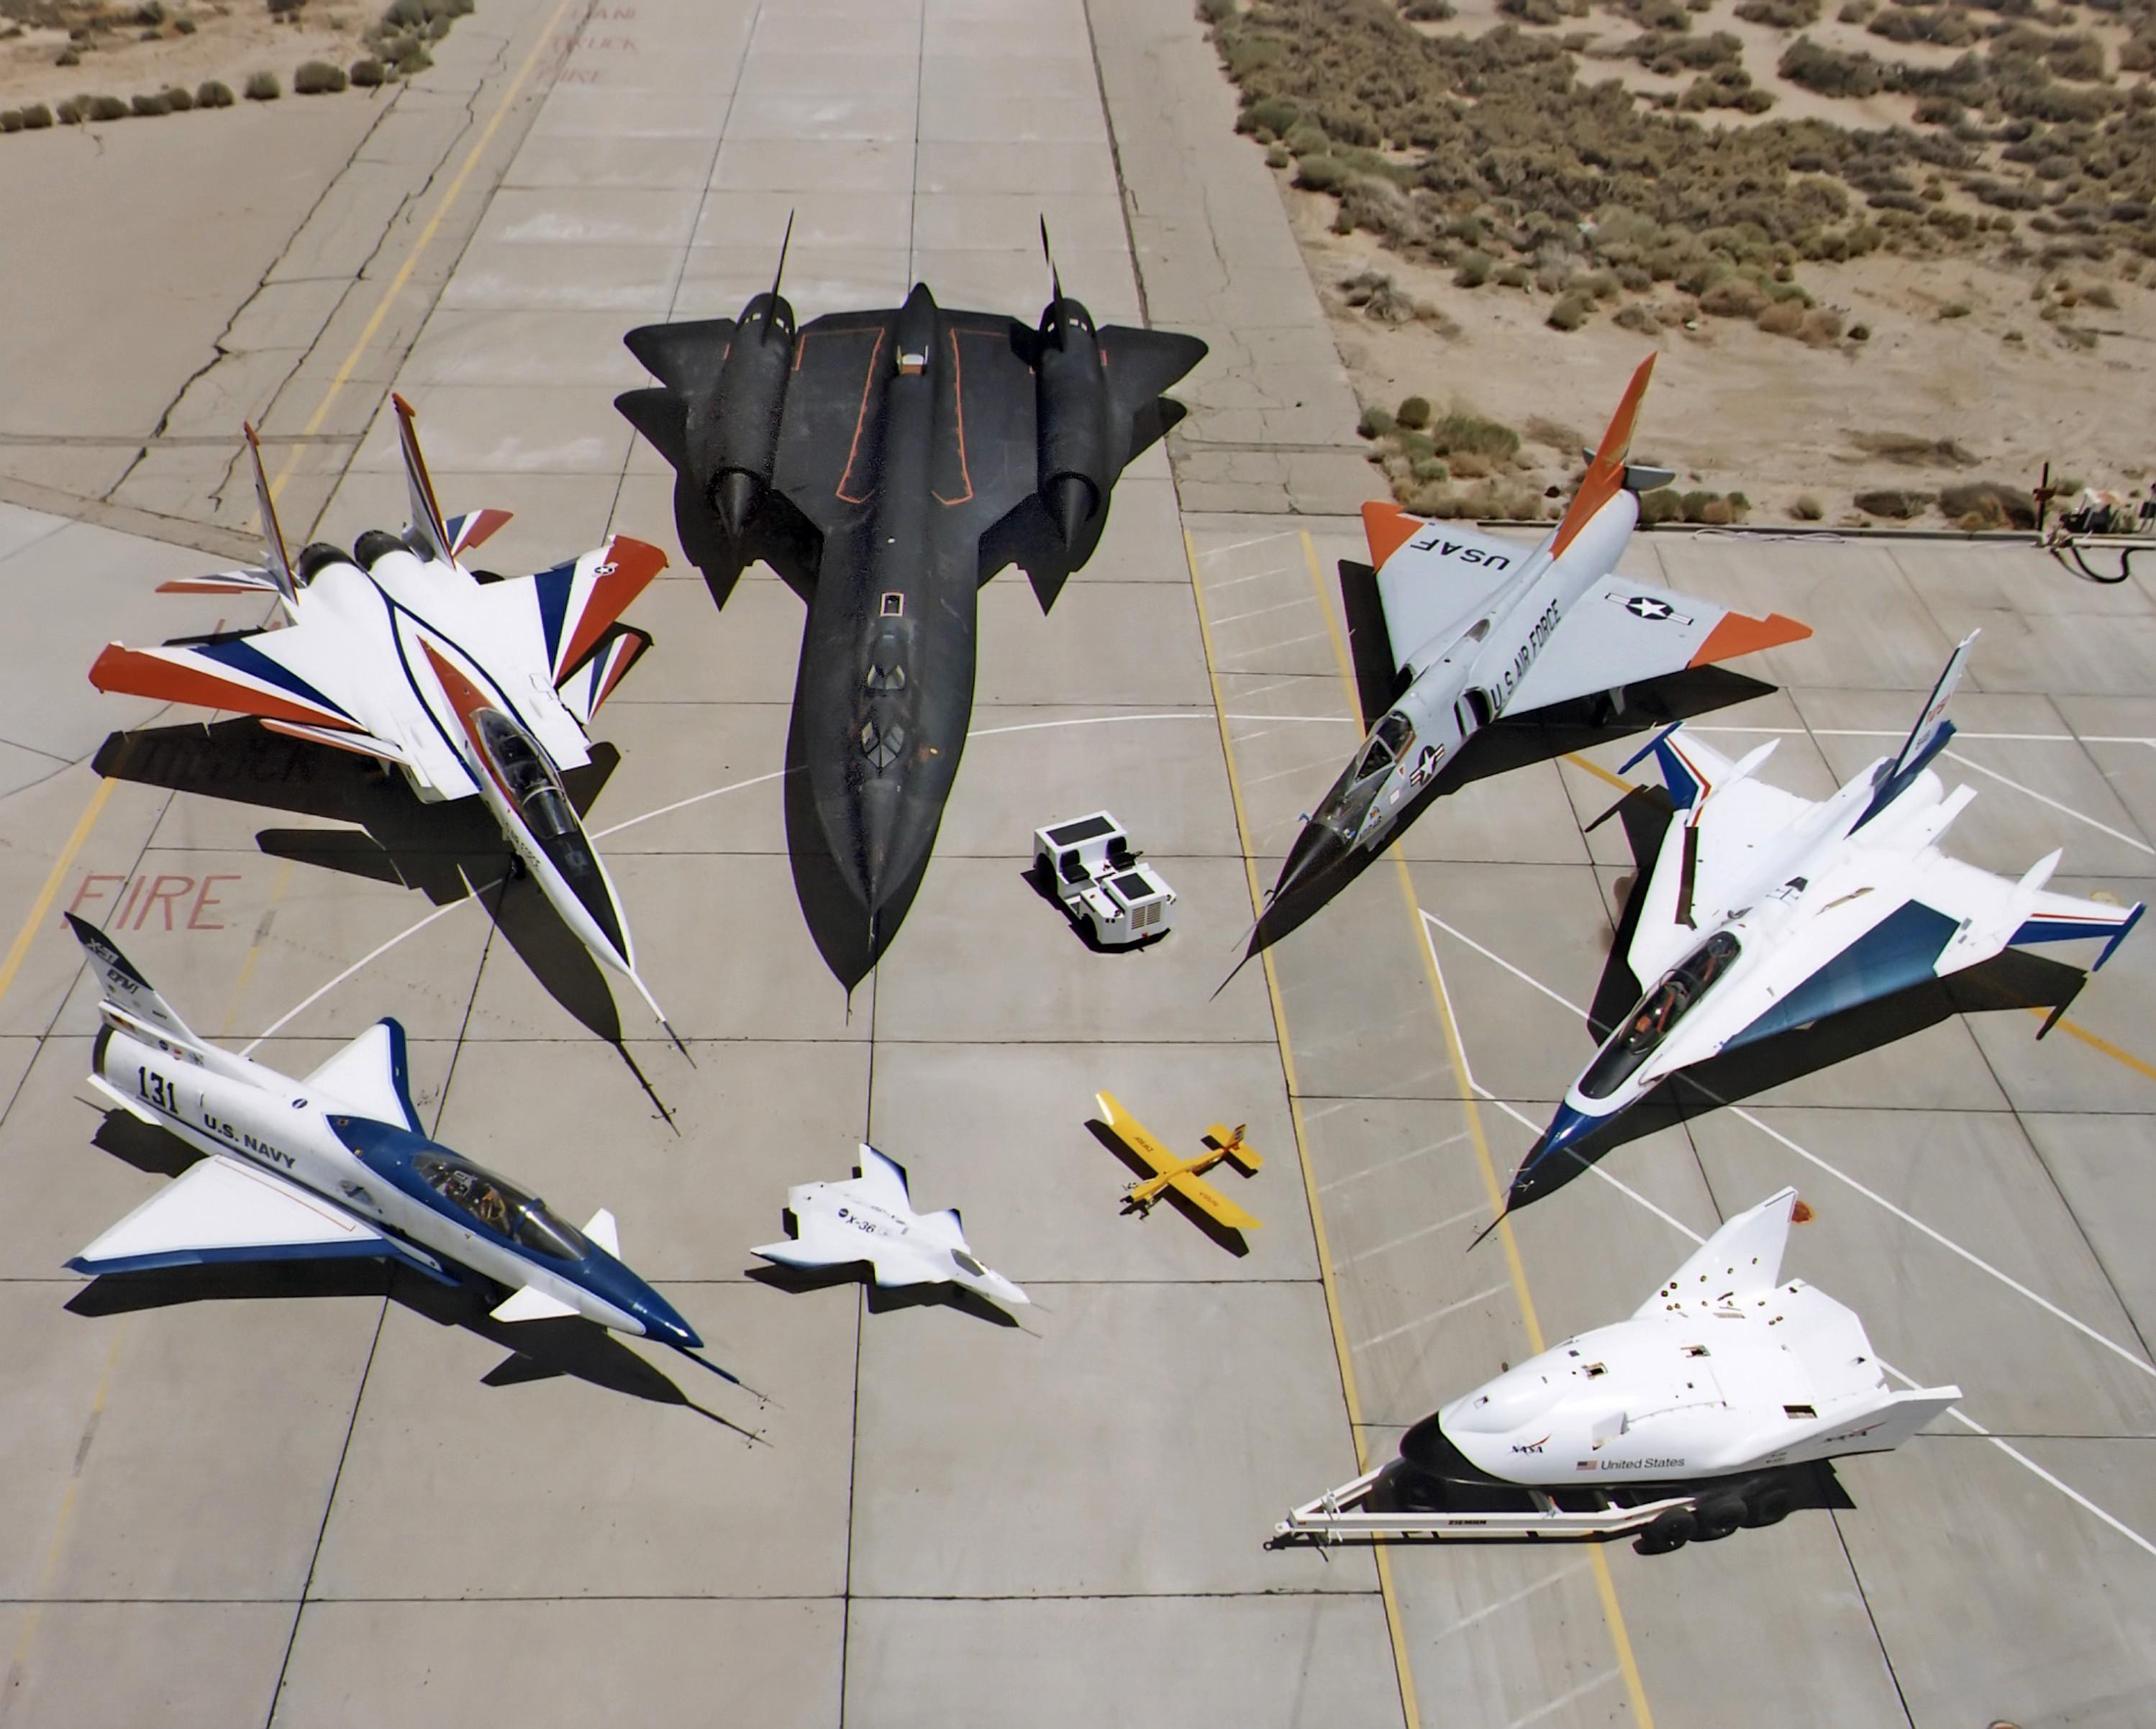 United states aircraft photo